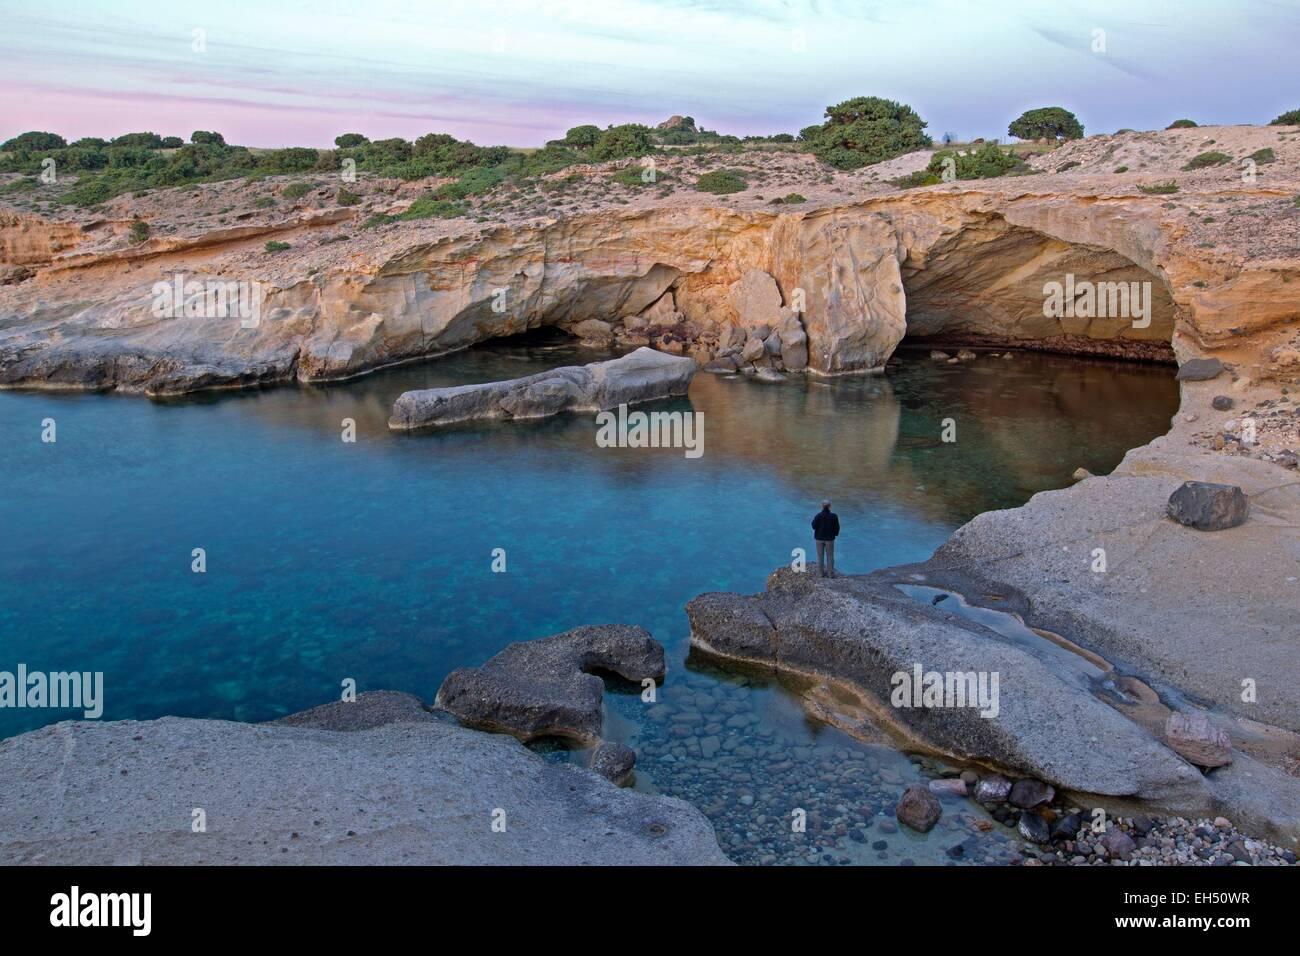 Greece, Cyclades, Island of Milos, Konstantinos - Stock Image